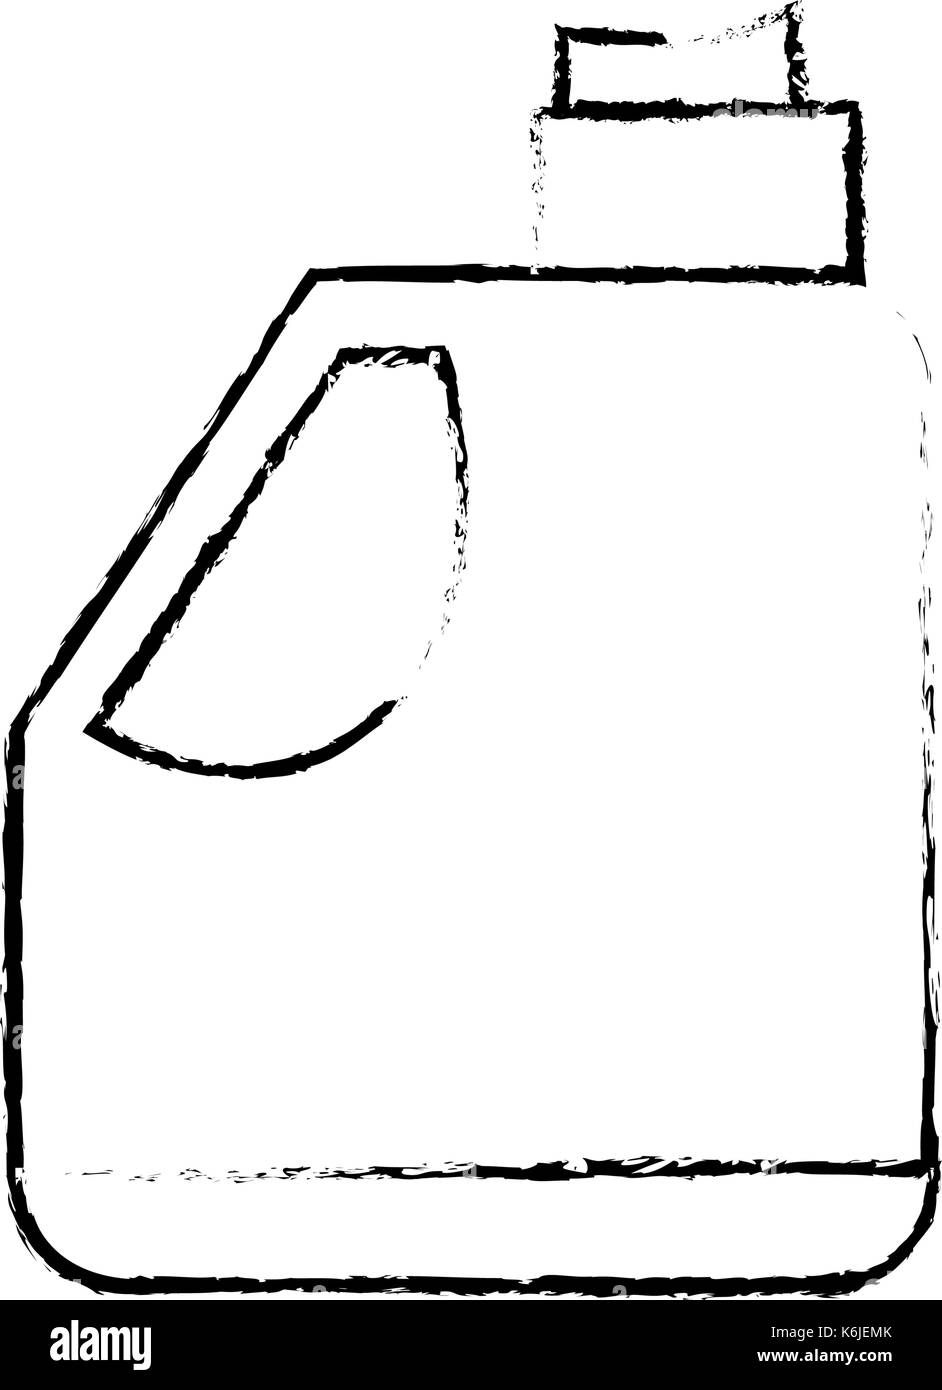 figure gasoline bottle to car industrial equipment - Stock Image